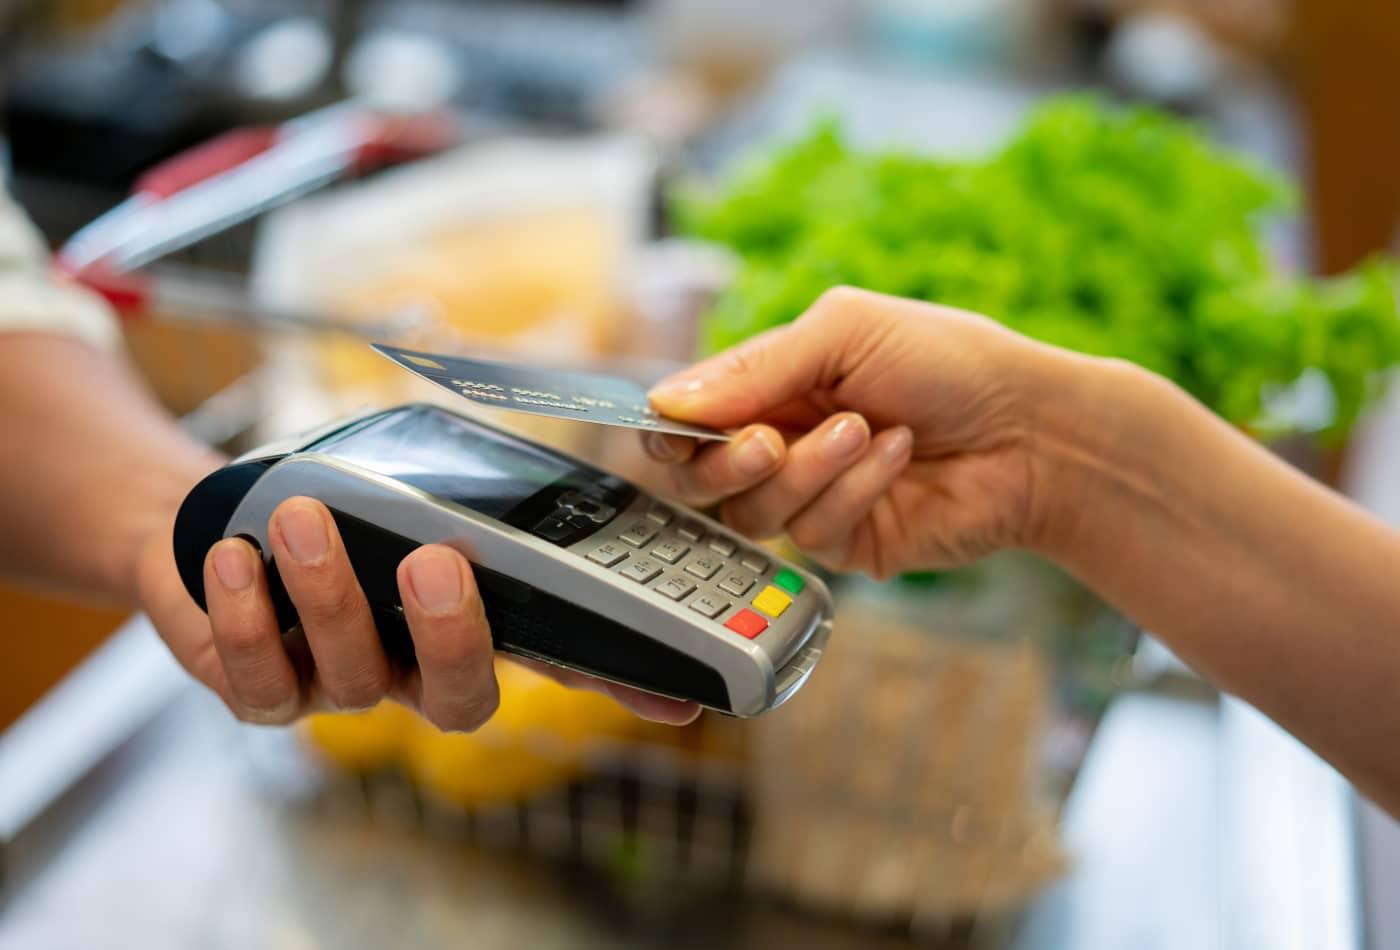 Best Credit Cards For Groceries Of November 2019